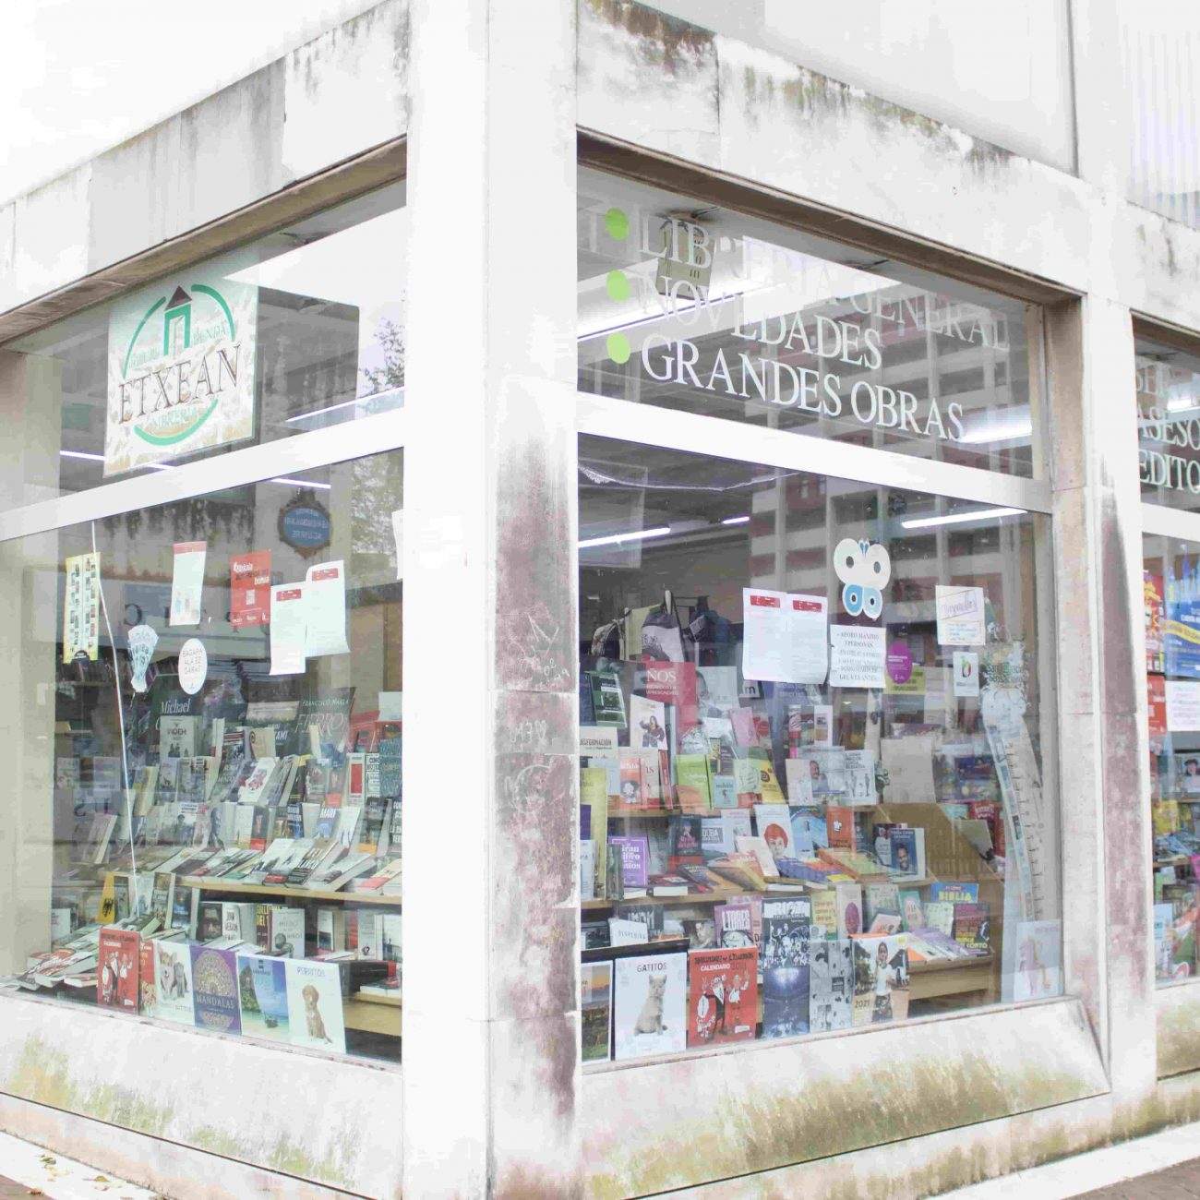 Librería Etxean en San Ignacio, Bilbao